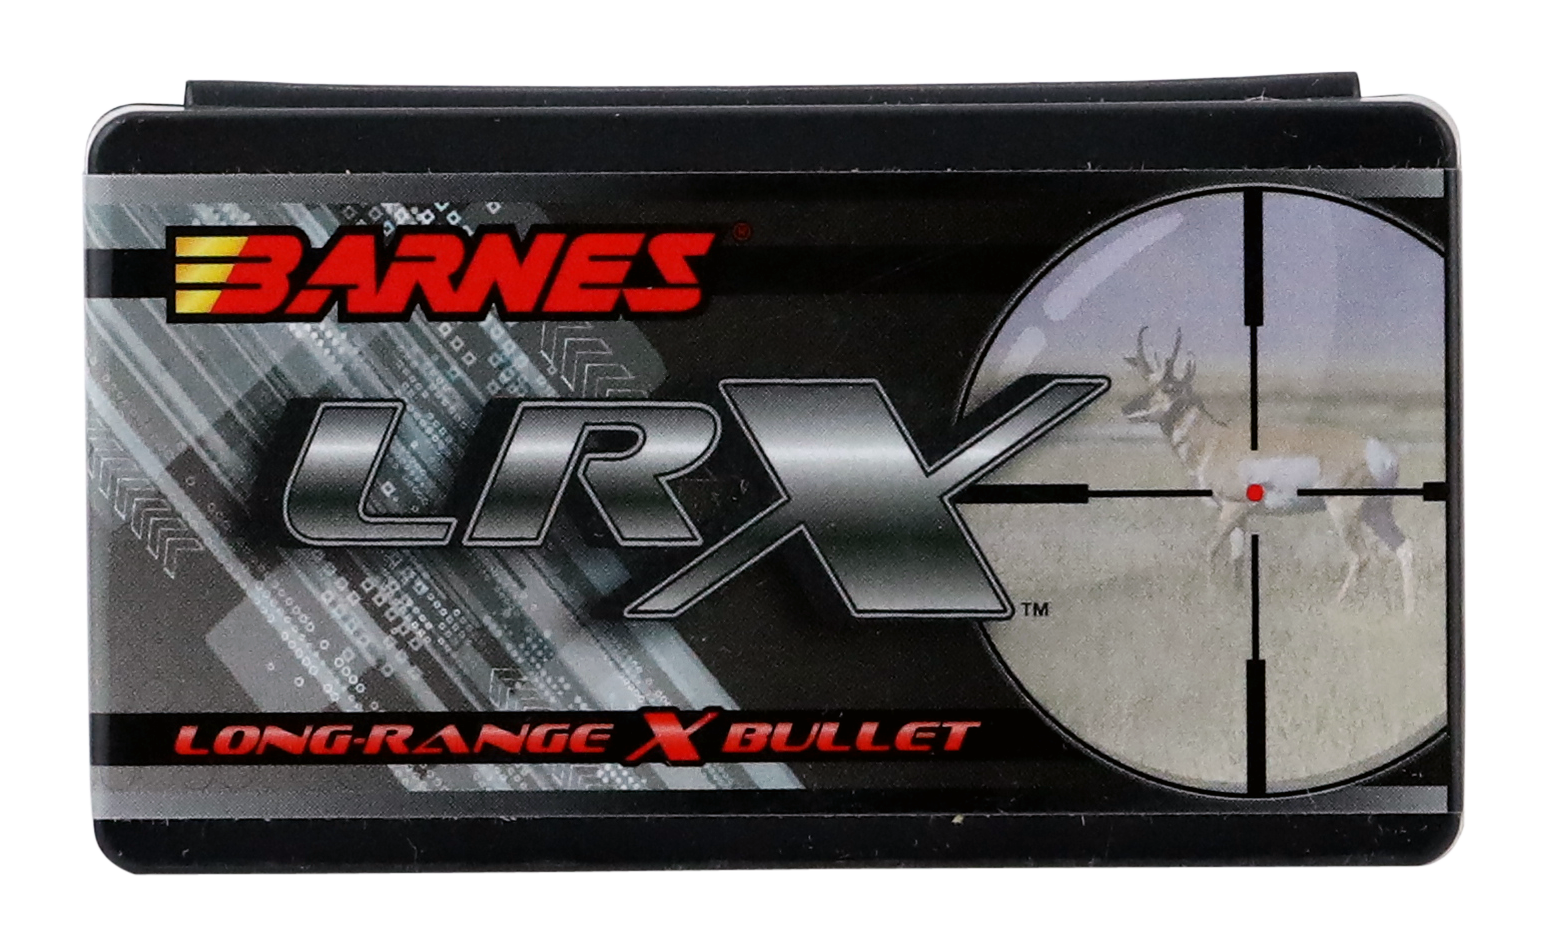 Barnes Bullets Lrx, Brns 30295 .284 139 Lrxbt 50